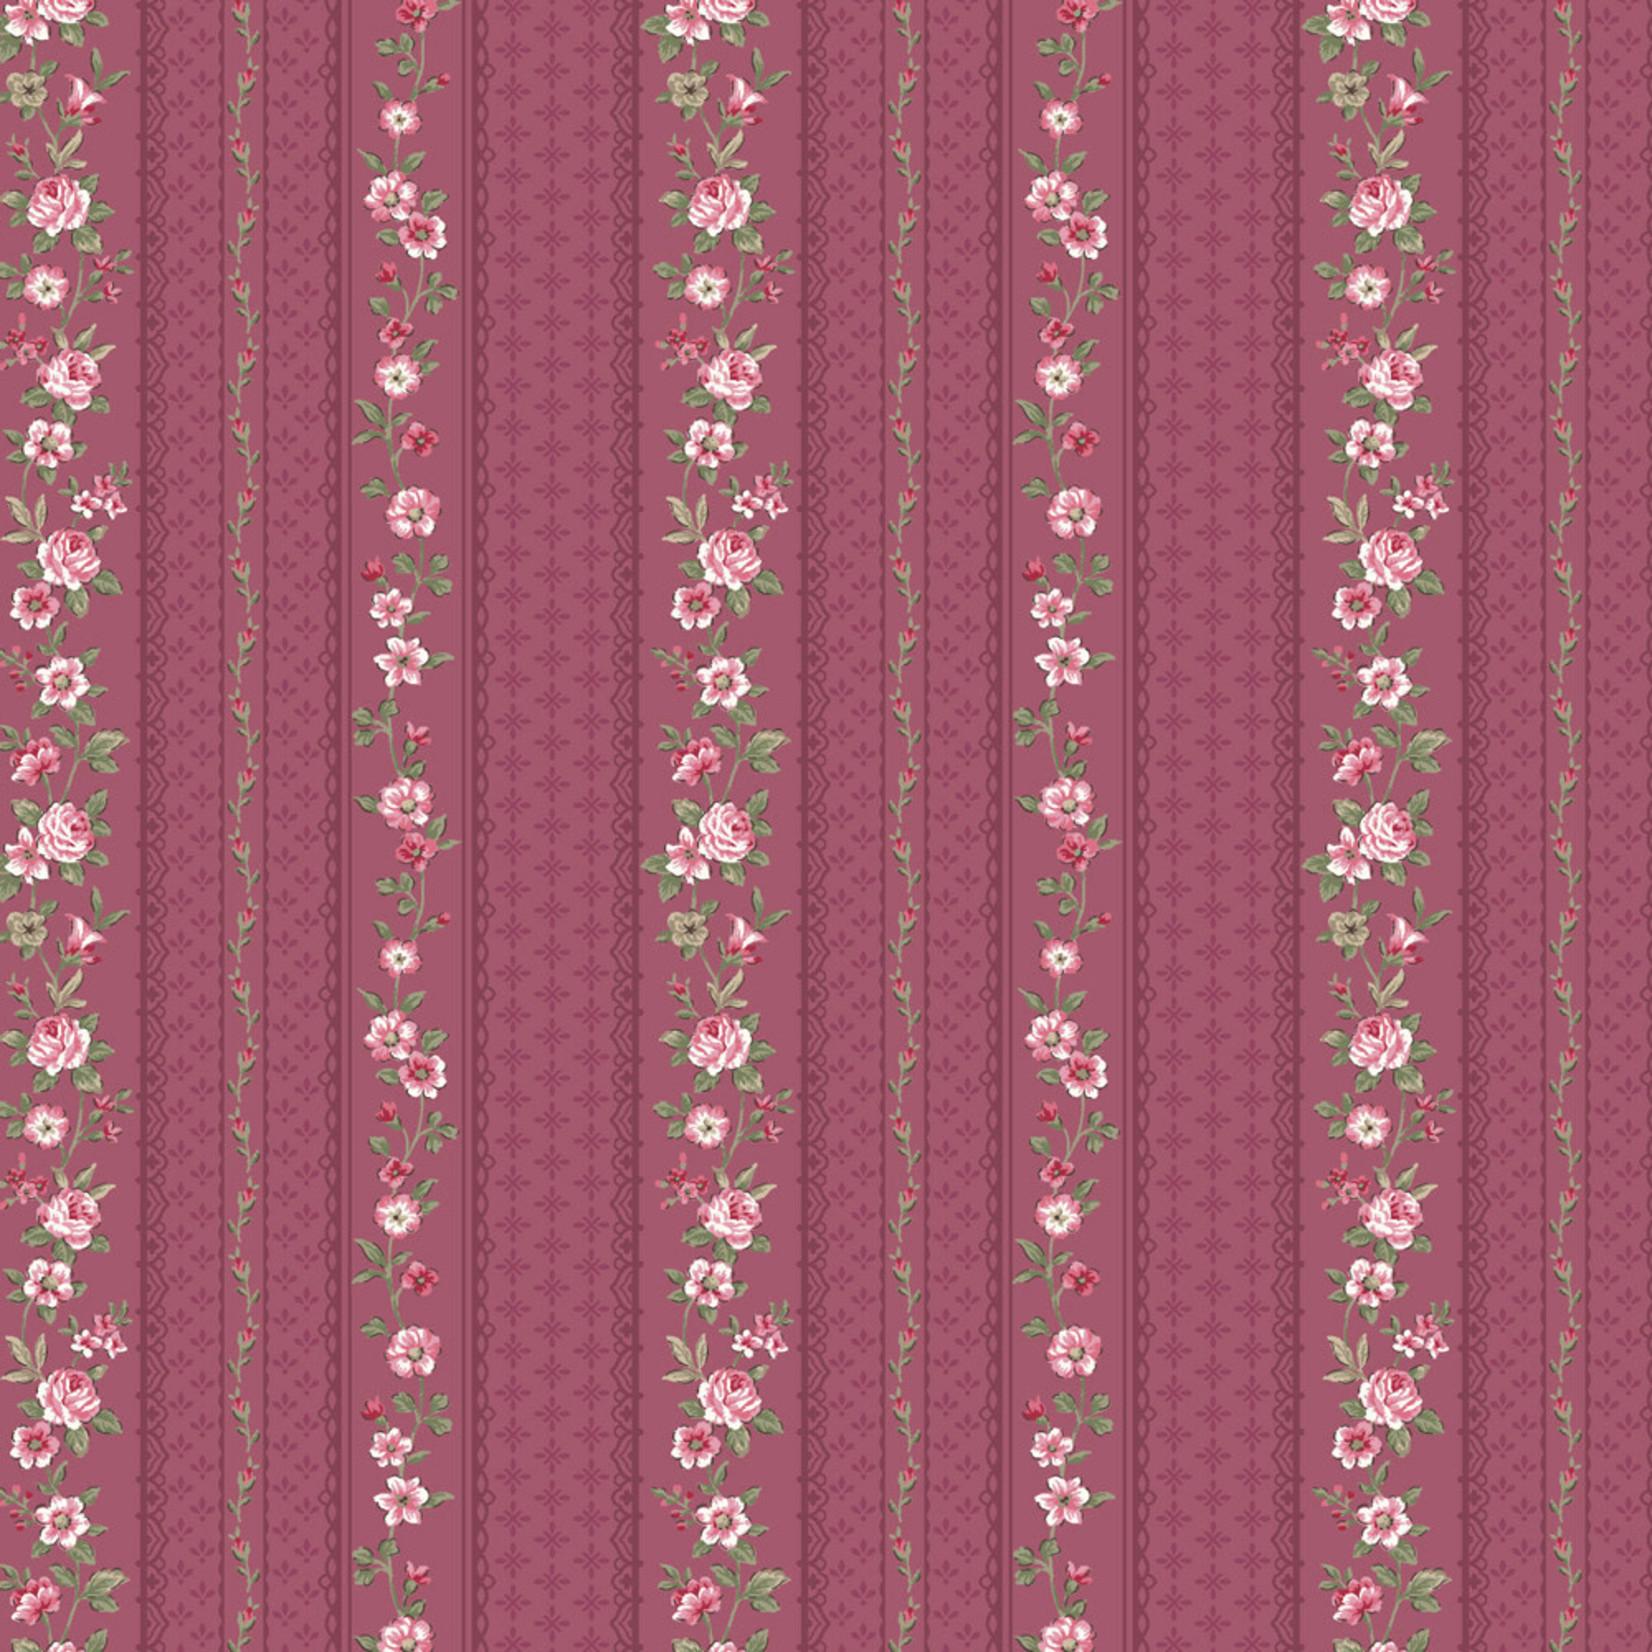 Stoffabrics Juliet Roses - Strips - Pink